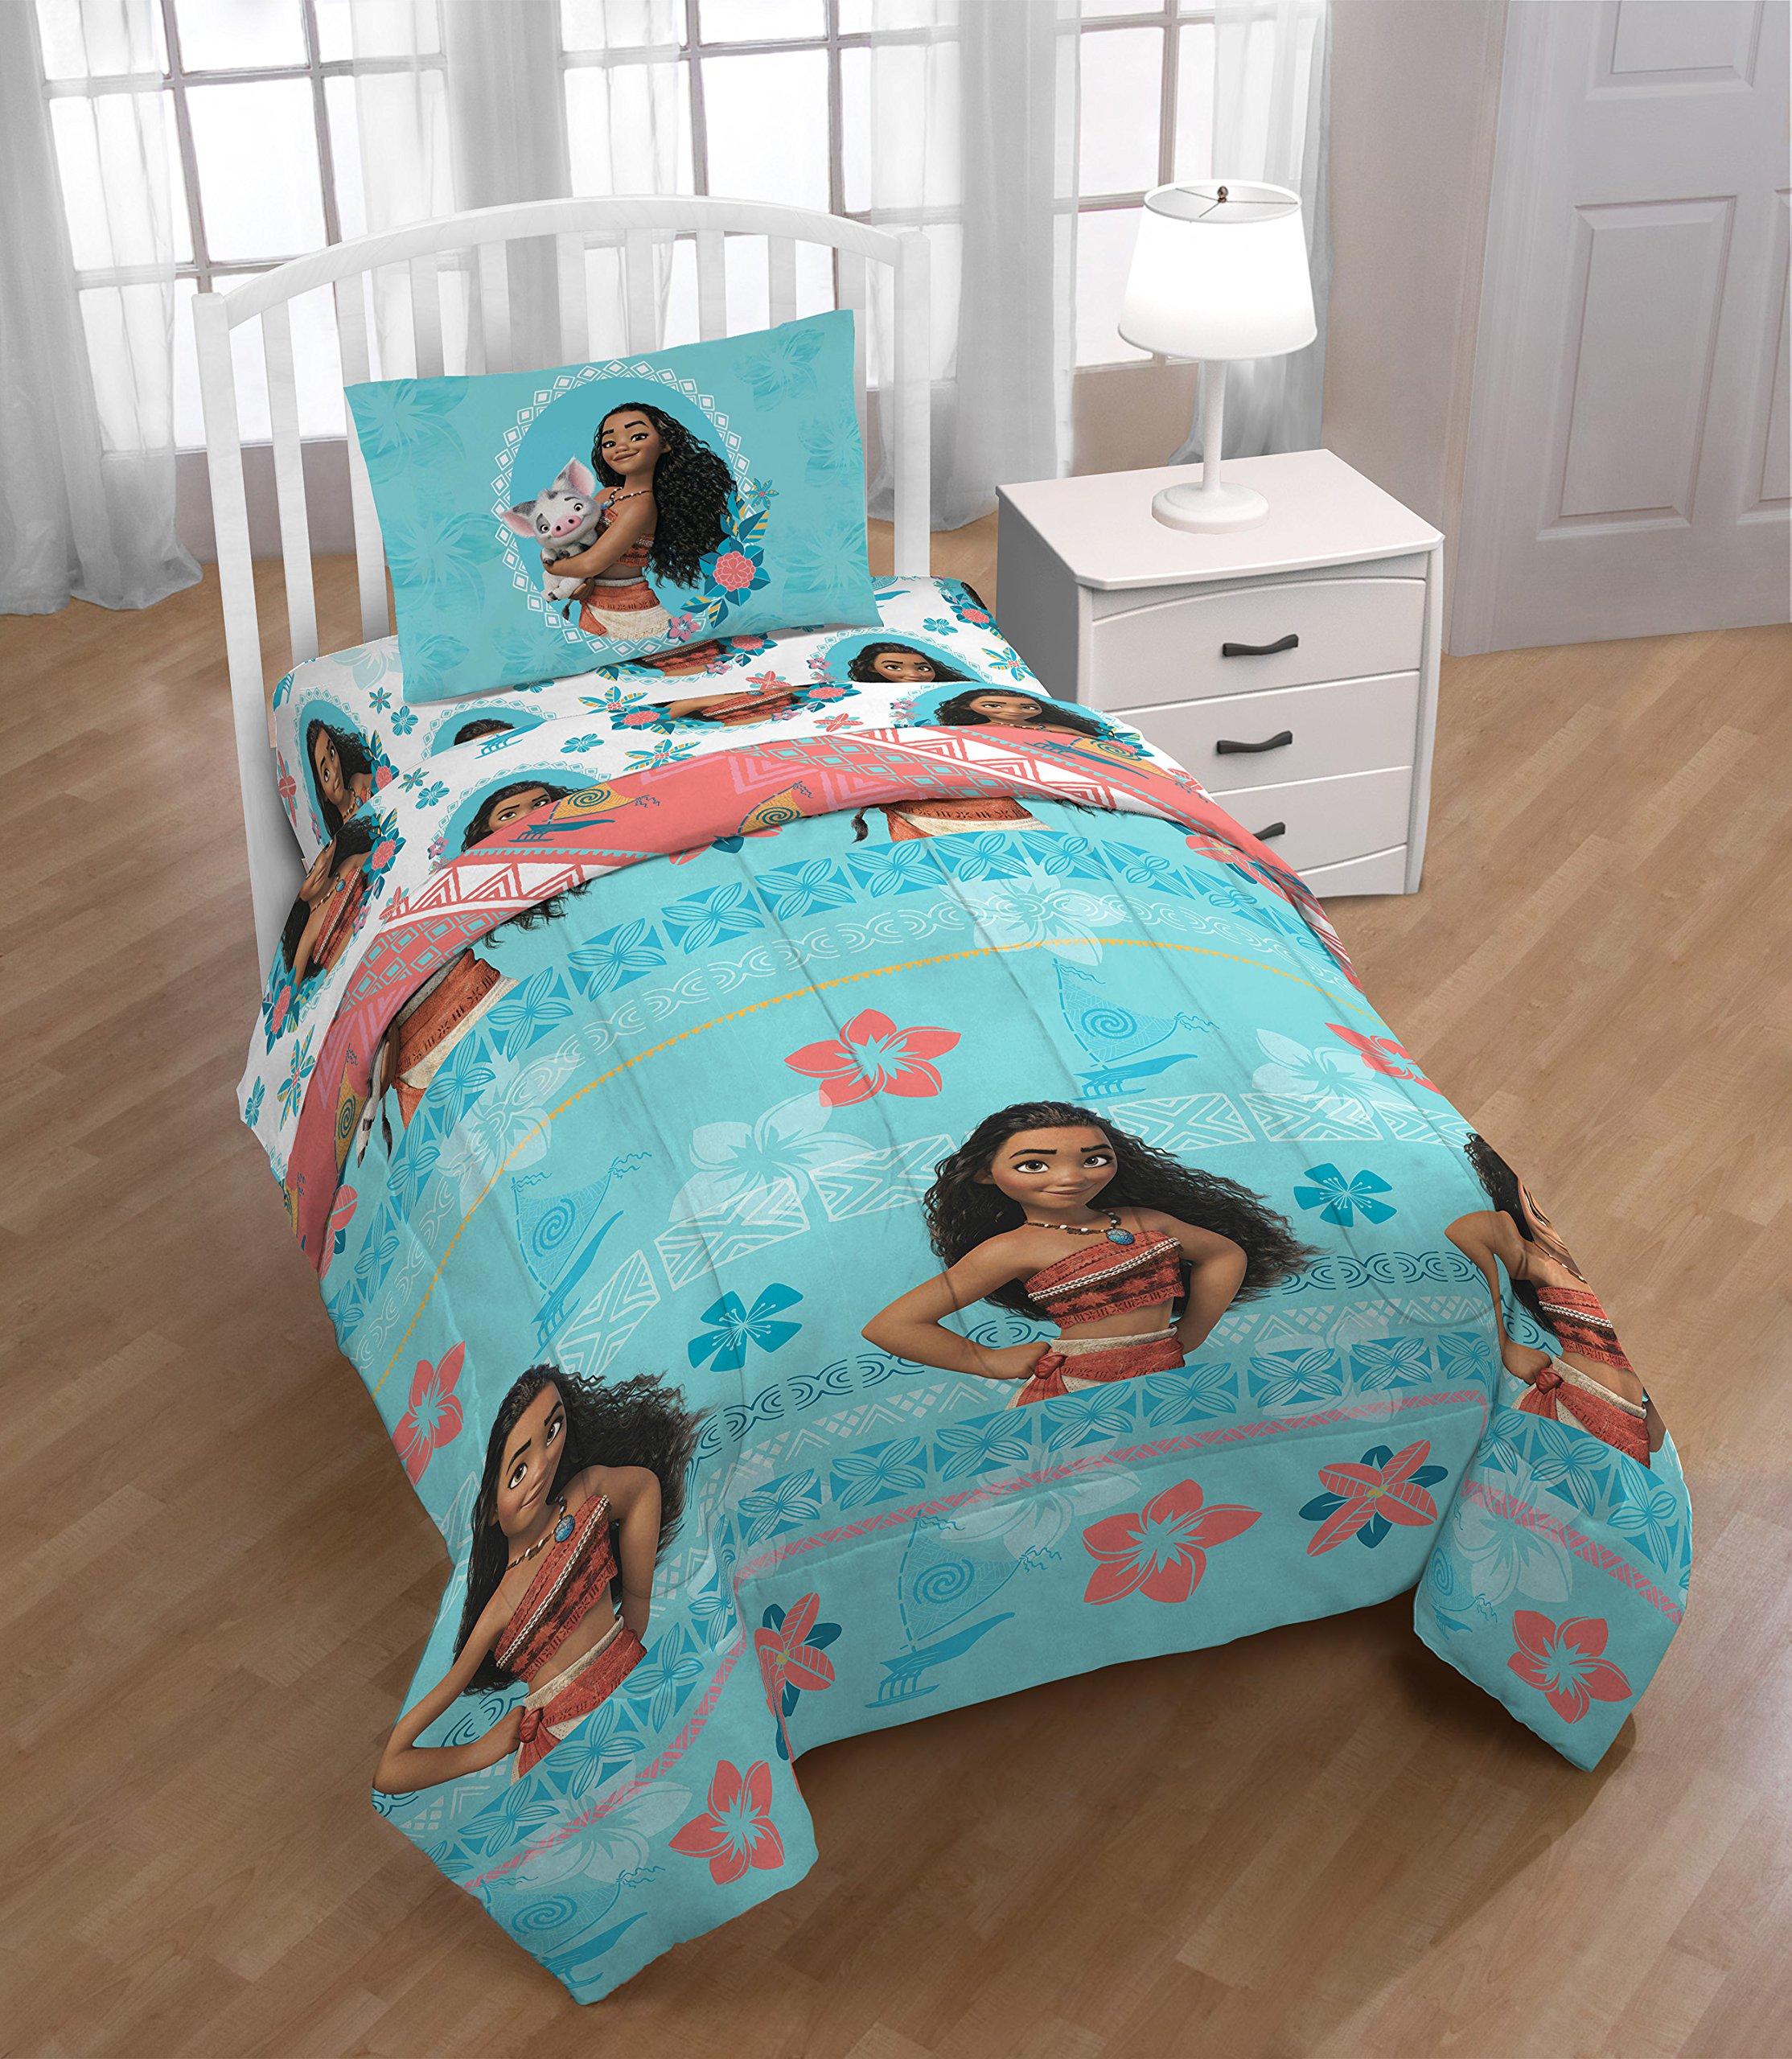 N2 5 Piece Kids Girls Hawaii Blue Moana Comforter Twin Set, Disney Bedding Surfing Hawaiian Themed Tropical Botanical Flowers Vibrant Colorful Pua Pig Pillow Orange Pink Yellow, Polyester